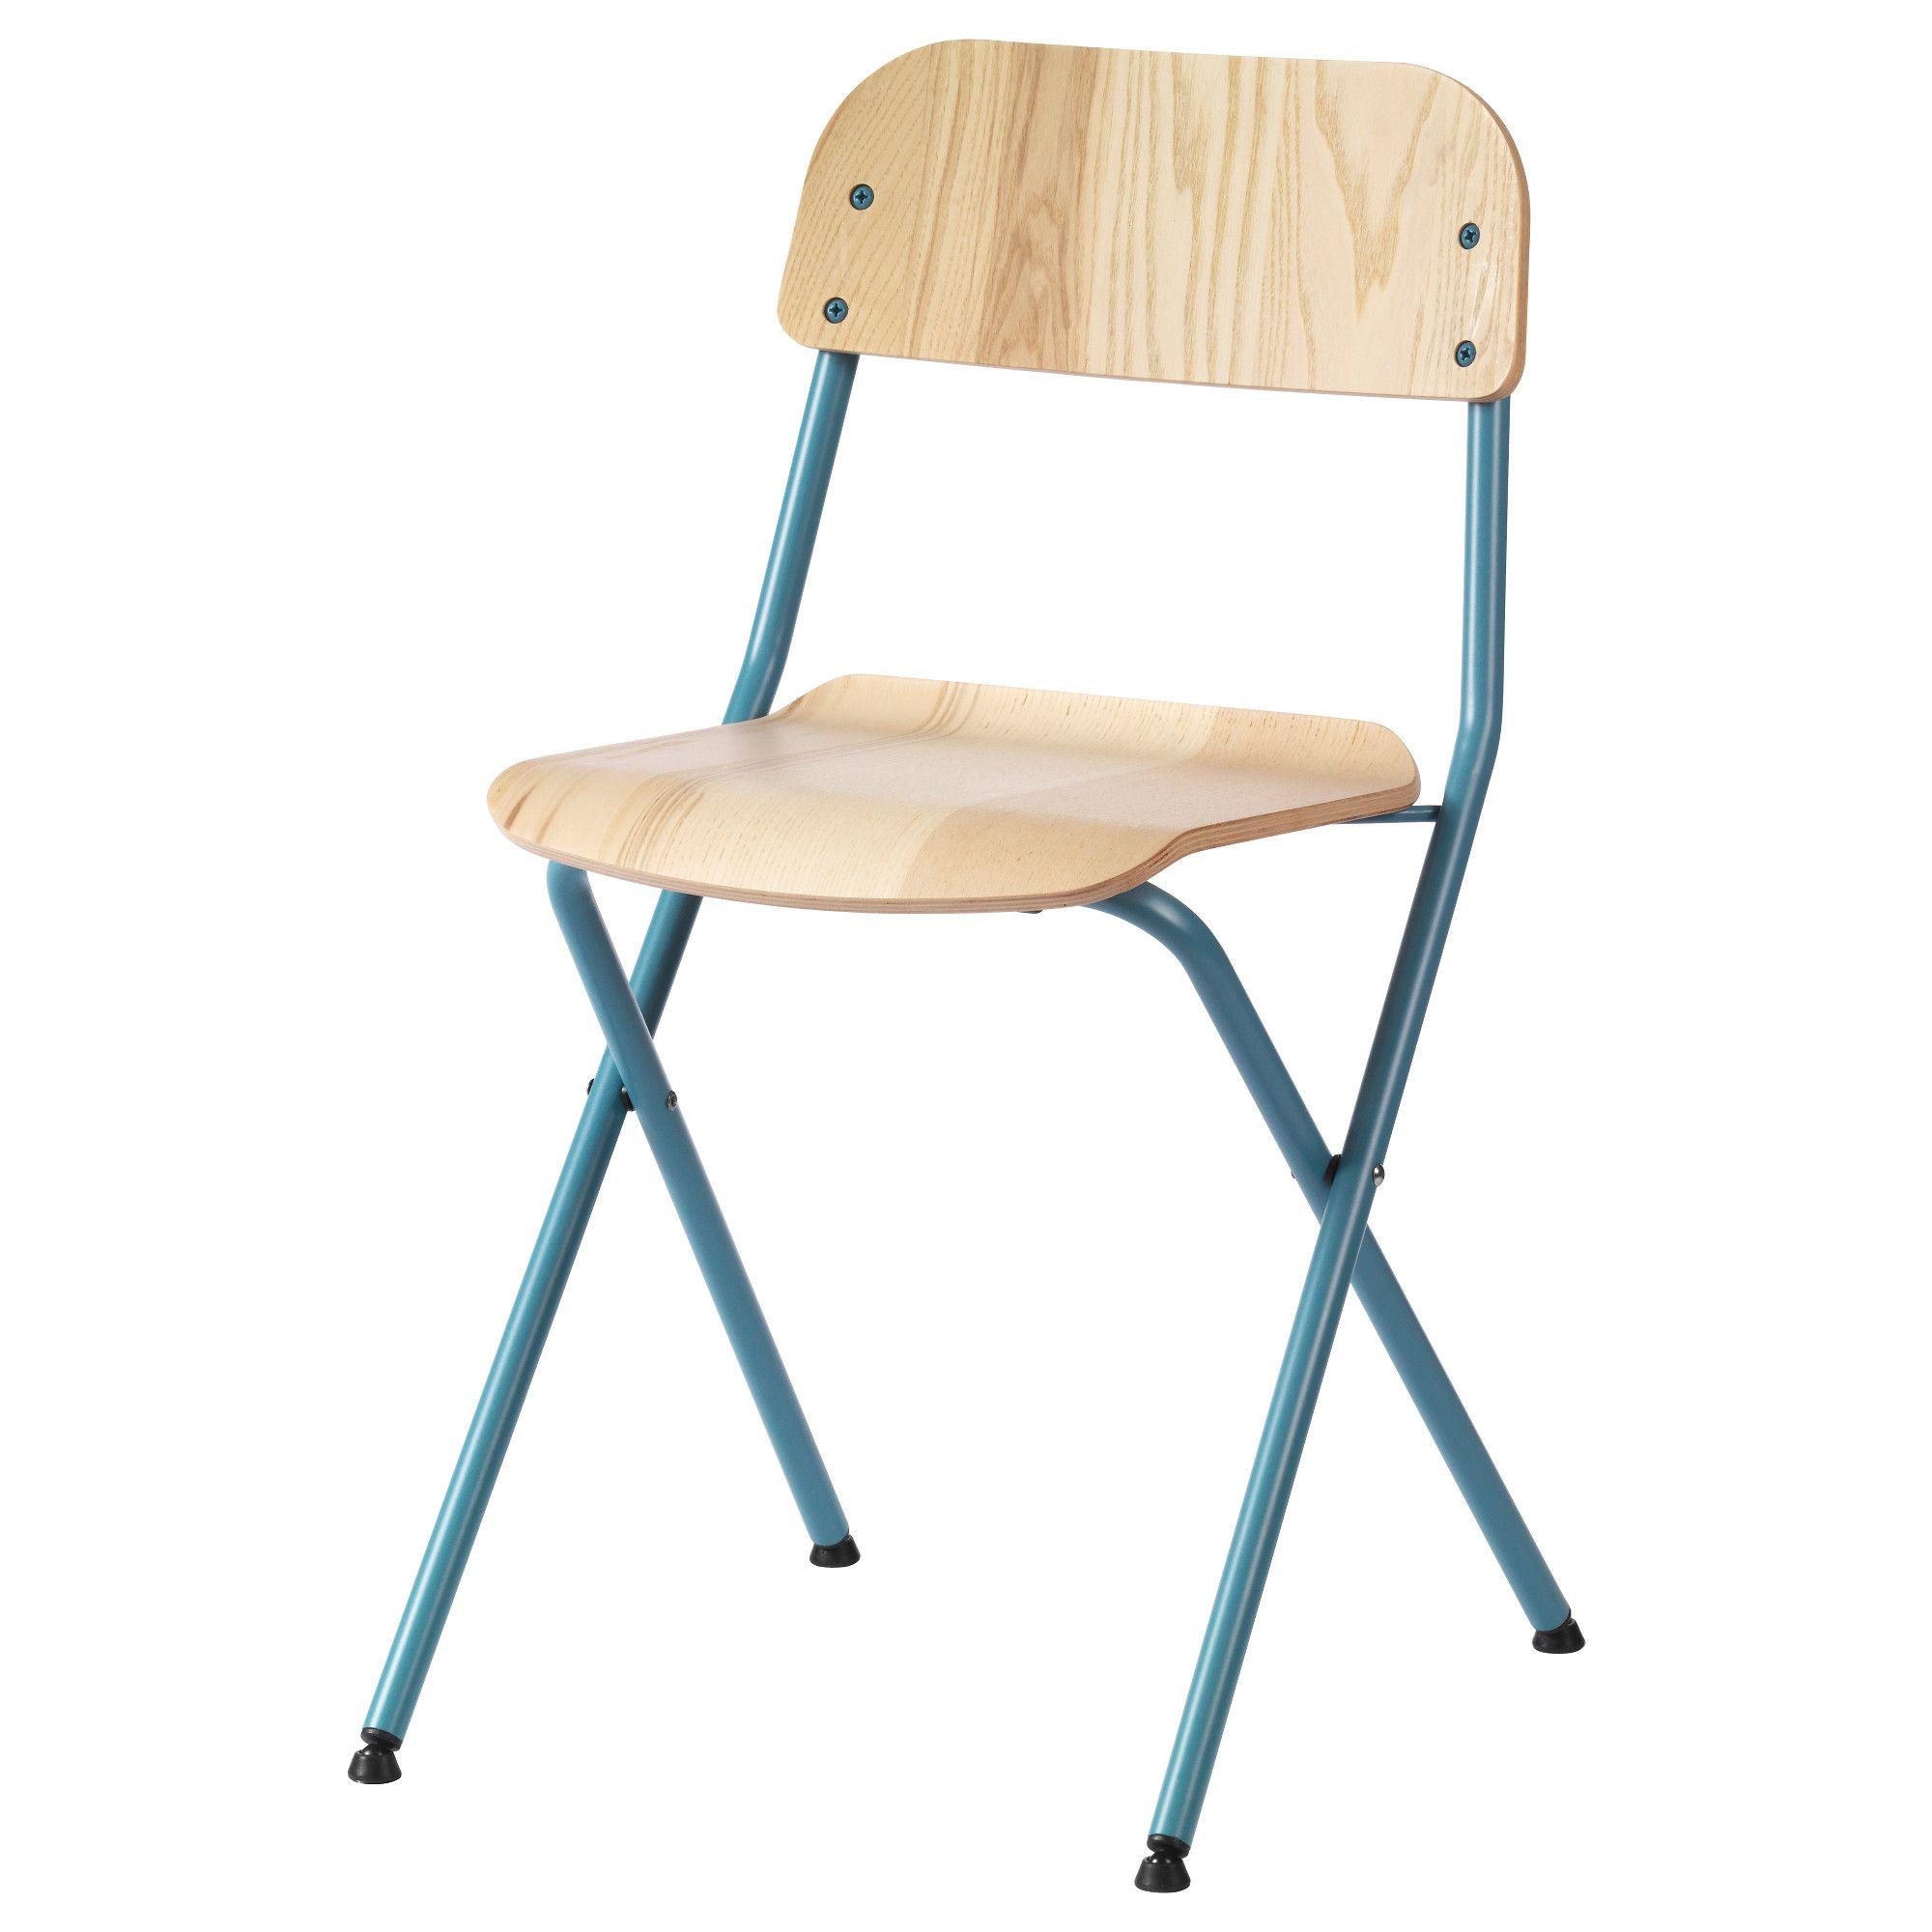 folding chair Ikea folding chairs, Folding chair